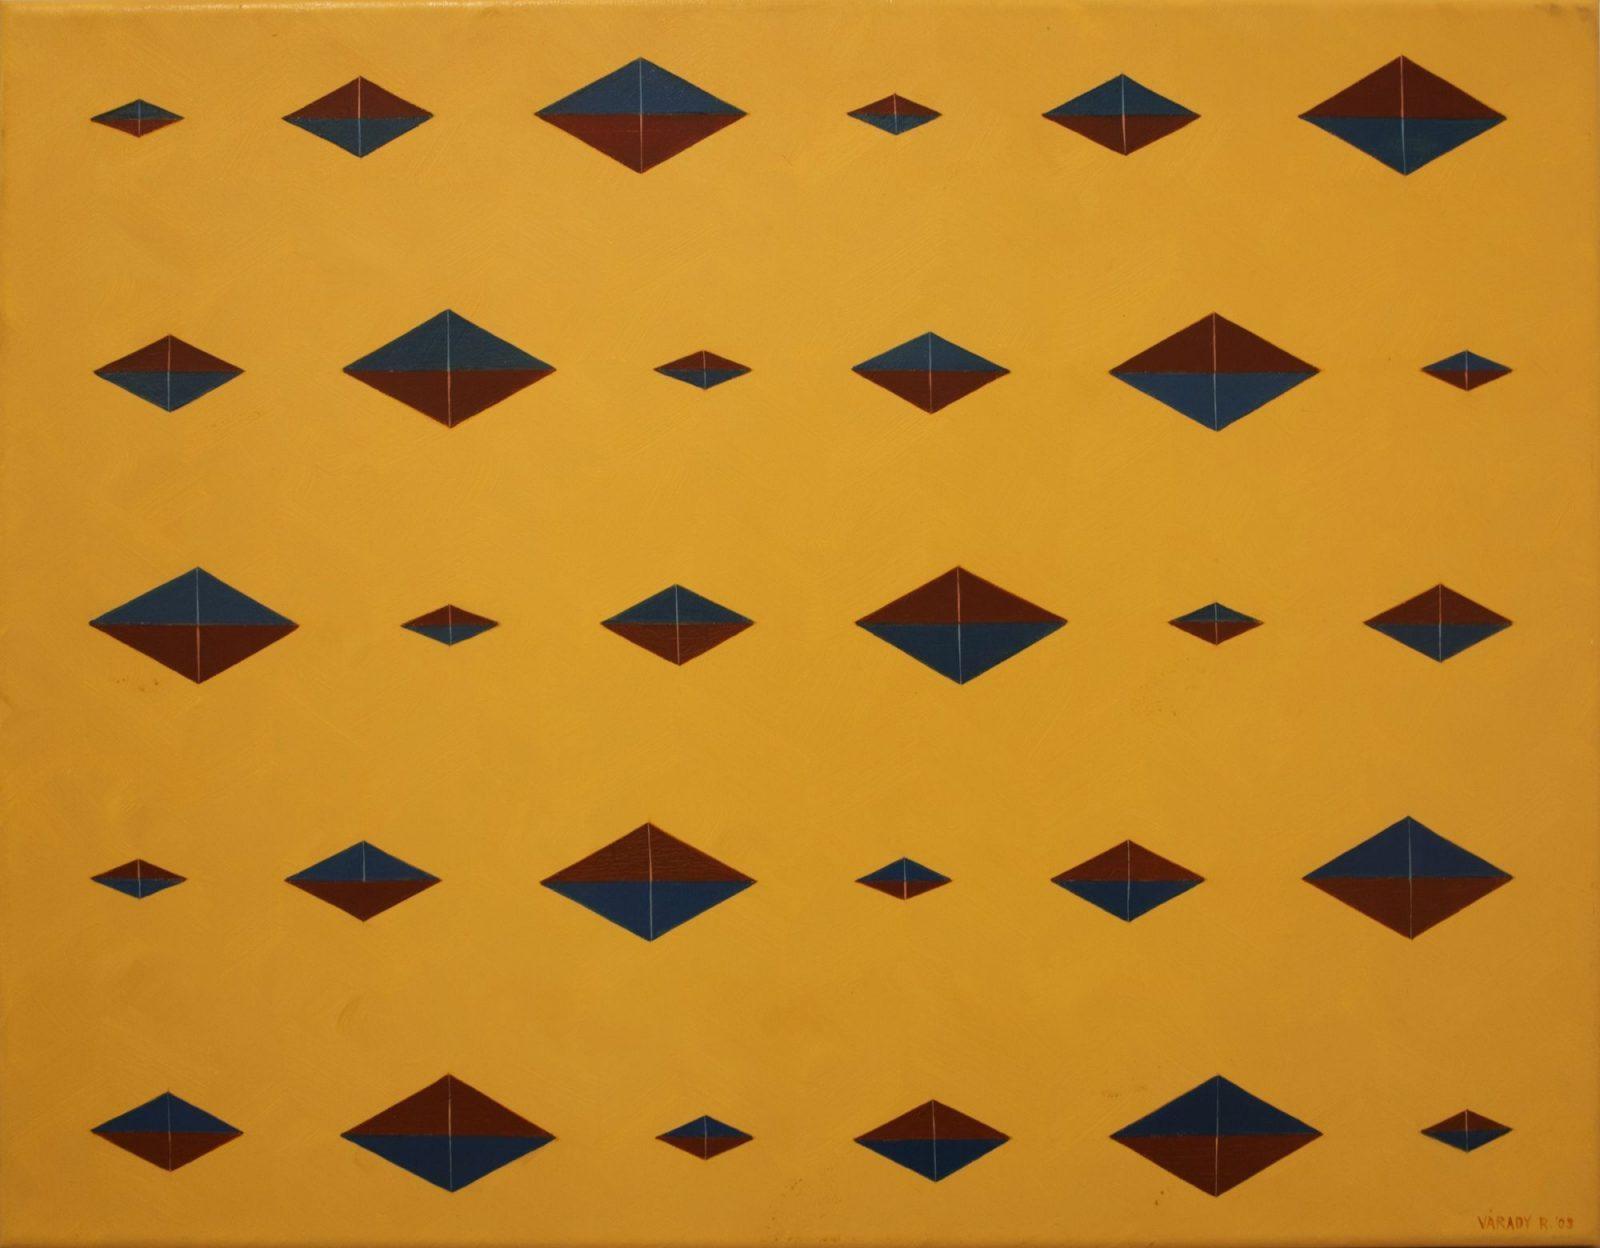 Róbert Várady: Fractals (Y+R+B)